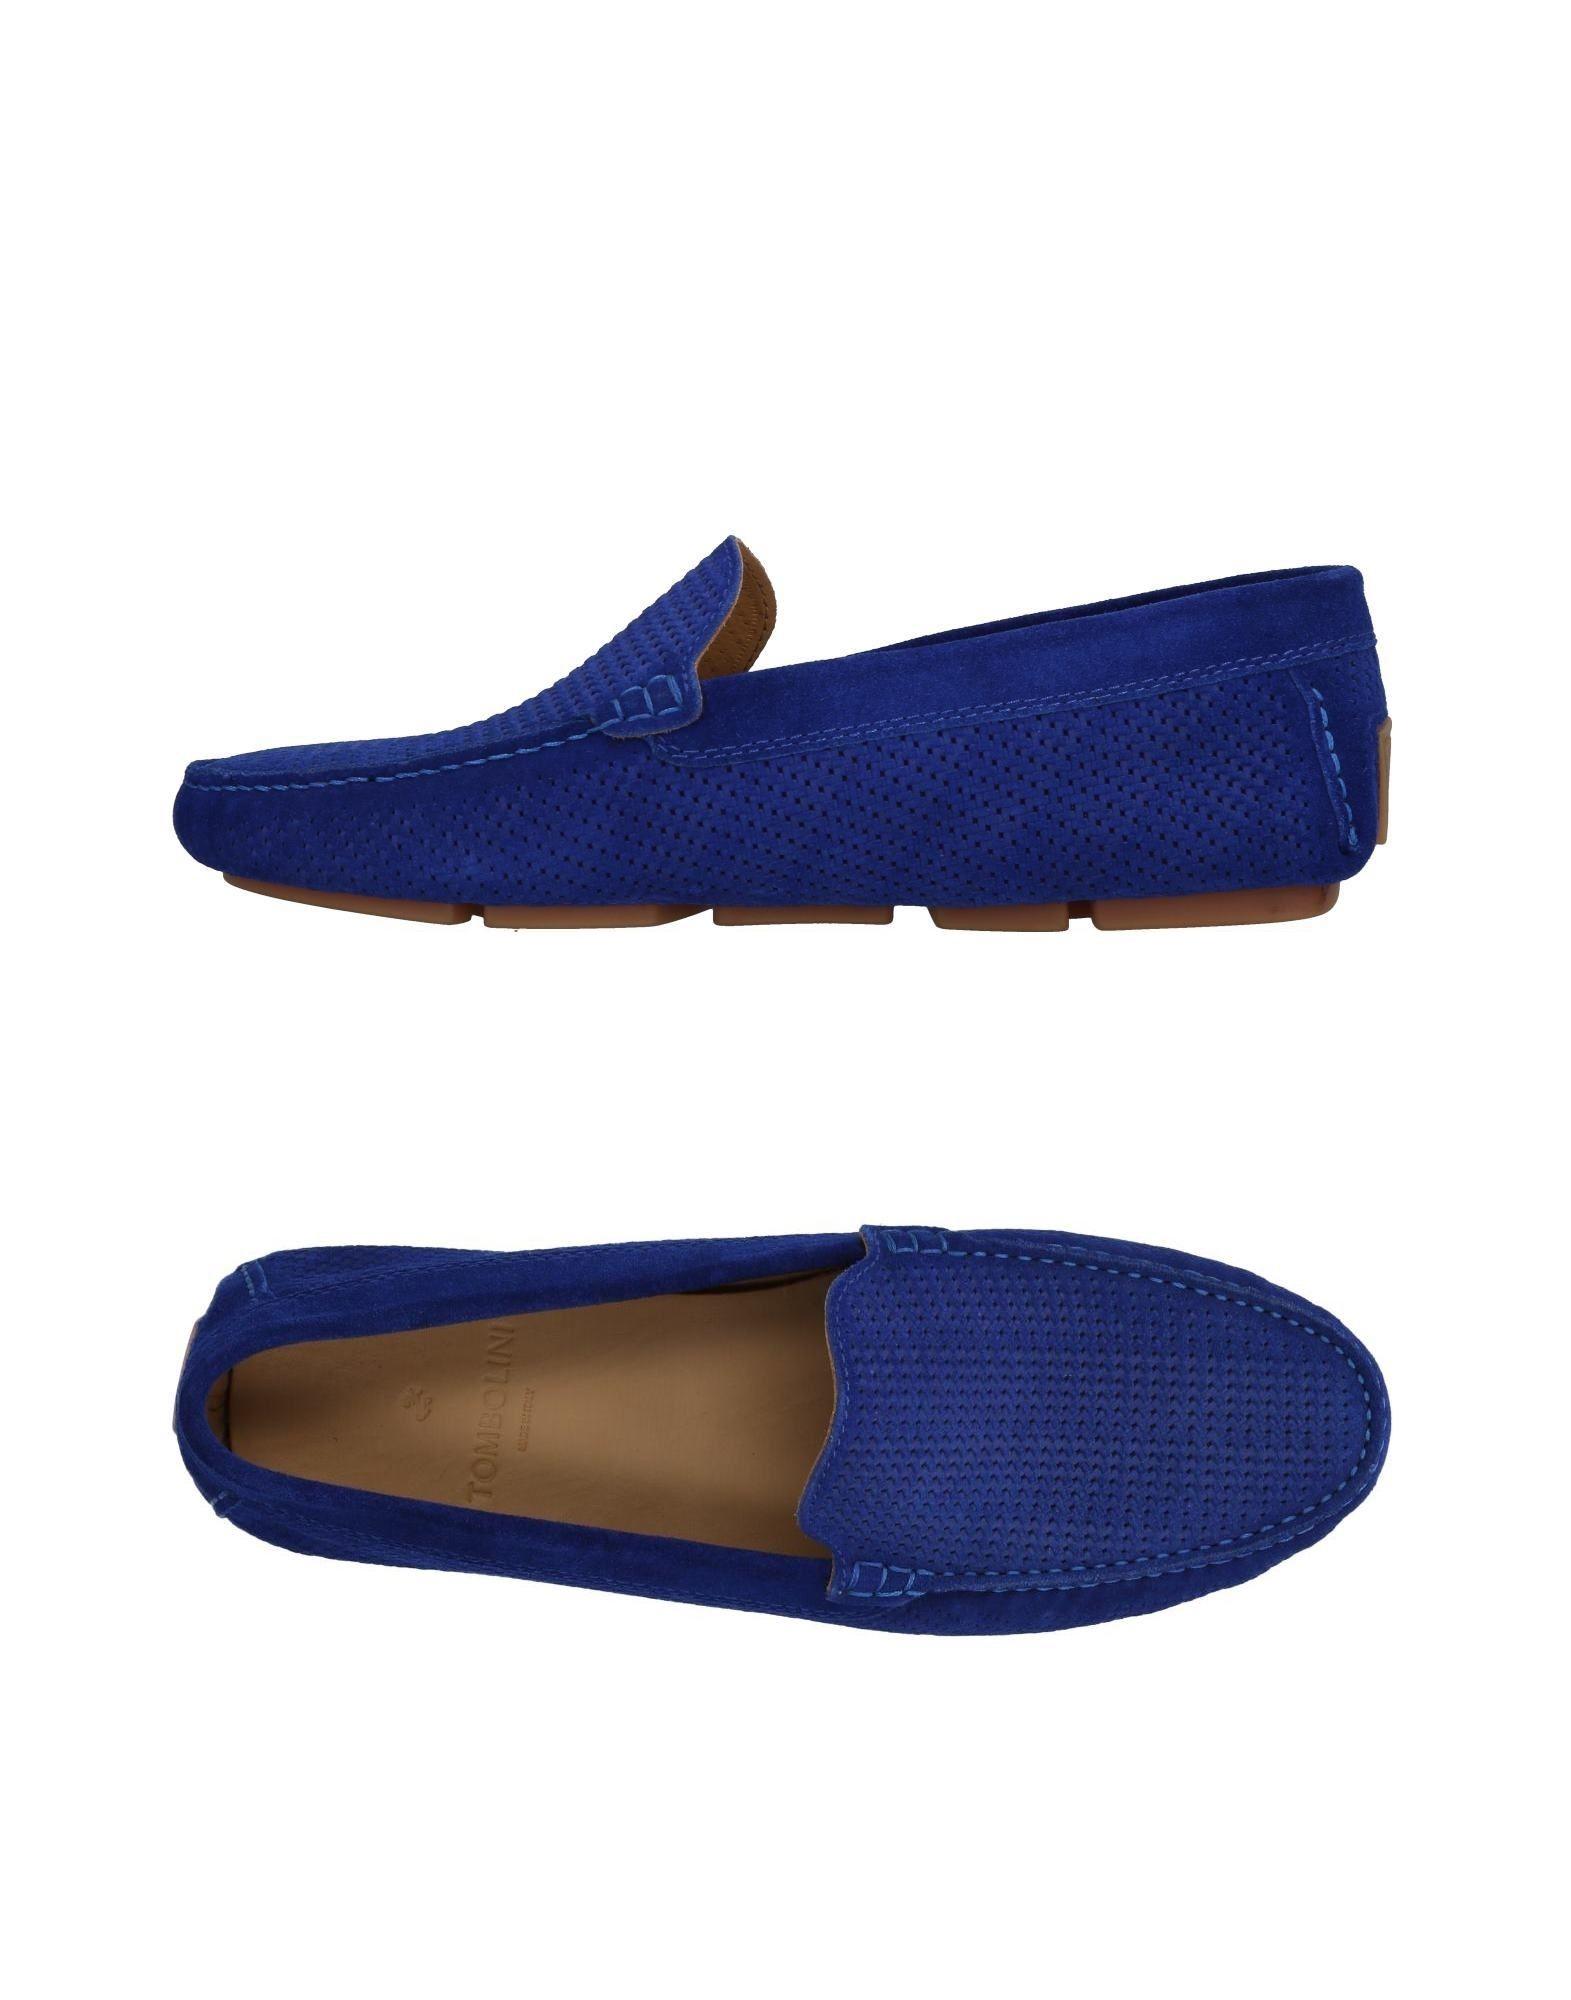 Tombolini Mokassins Herren  11469266DV Gute Qualität beliebte Schuhe